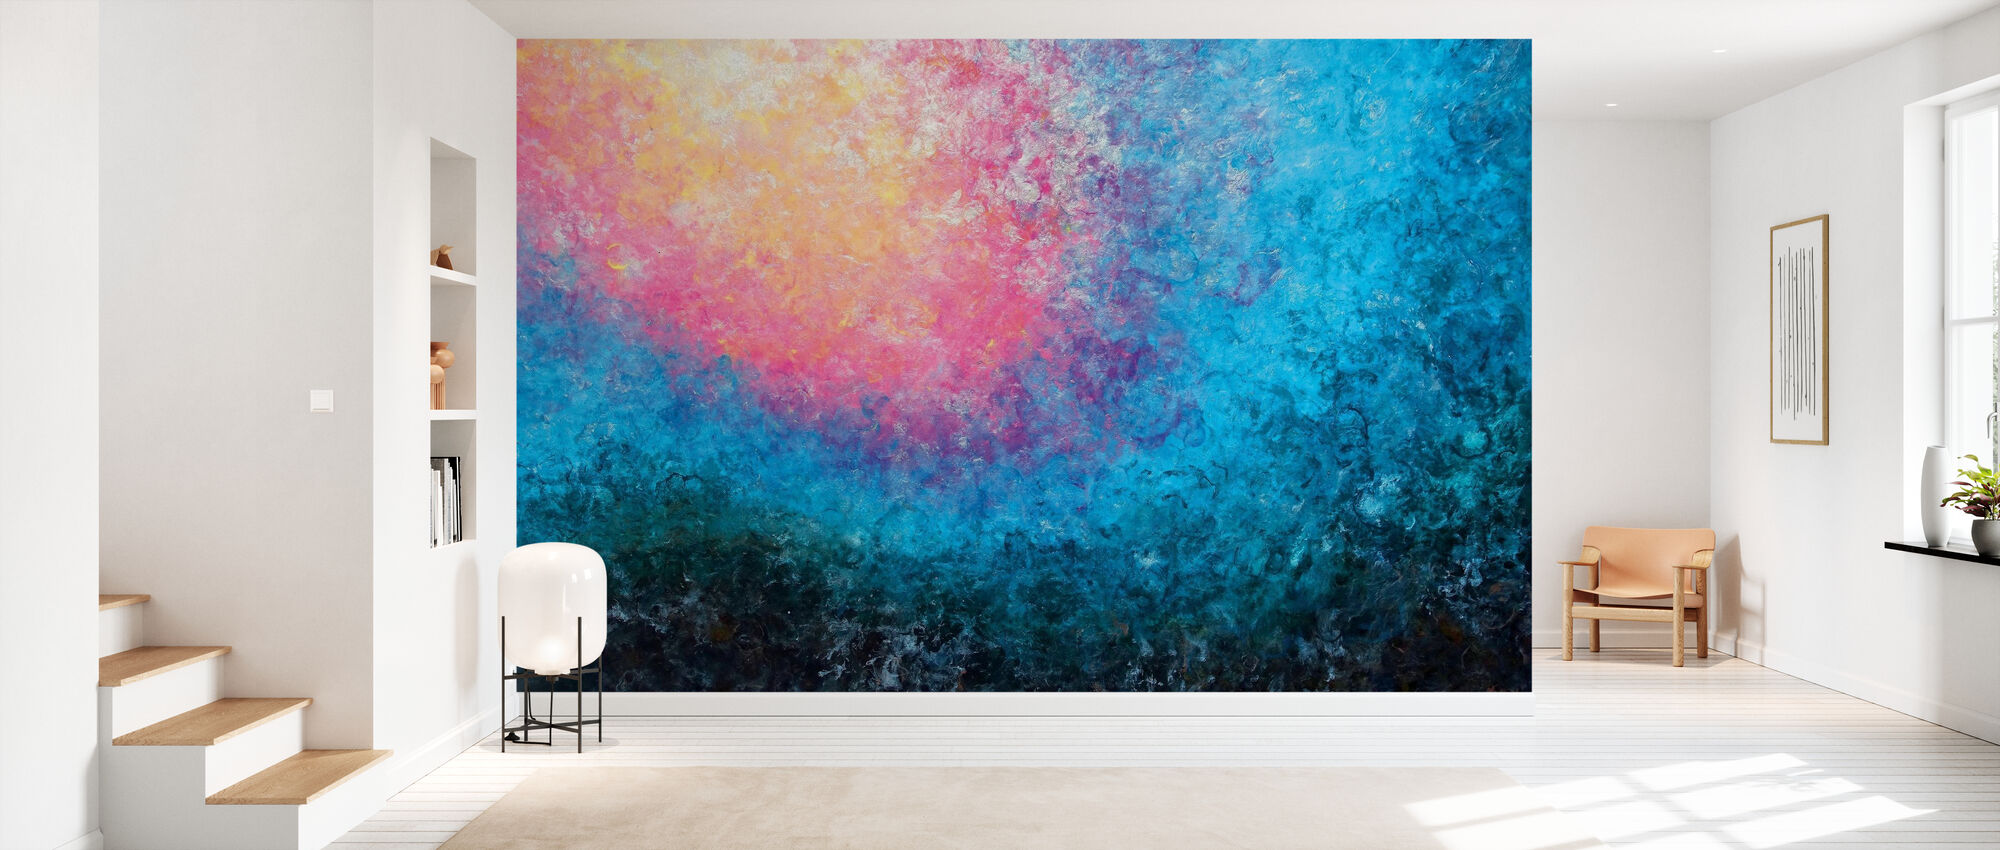 Blooming Tide - Wallpaper - Hallway